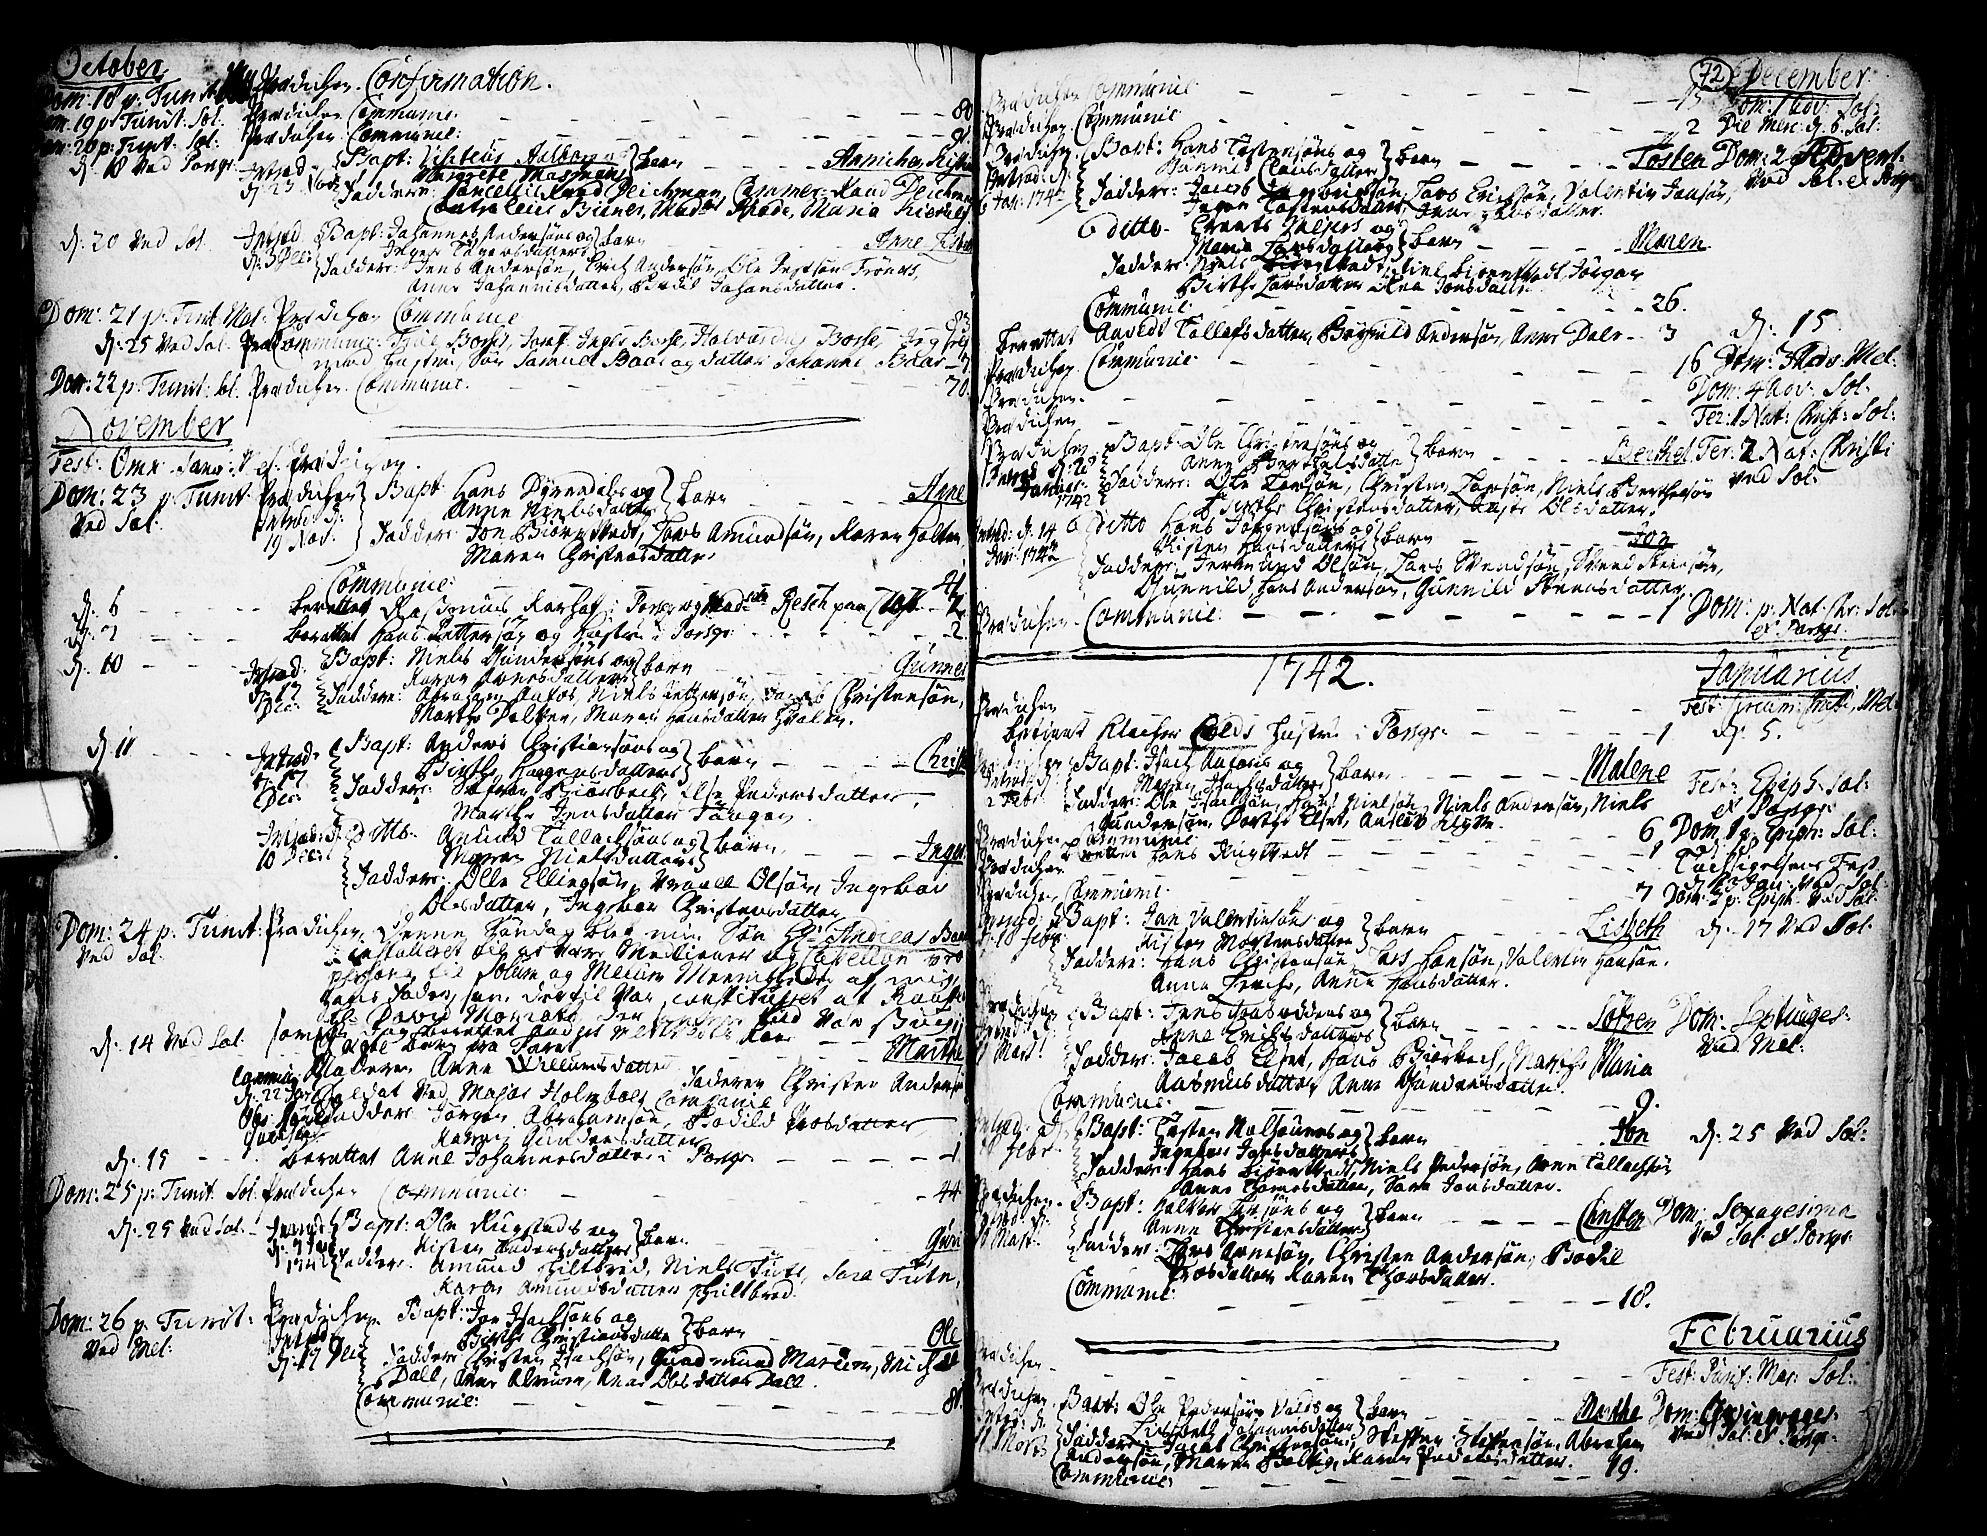 SAKO, Solum kirkebøker, F/Fa/L0002: Ministerialbok nr. I 2, 1713-1761, s. 72